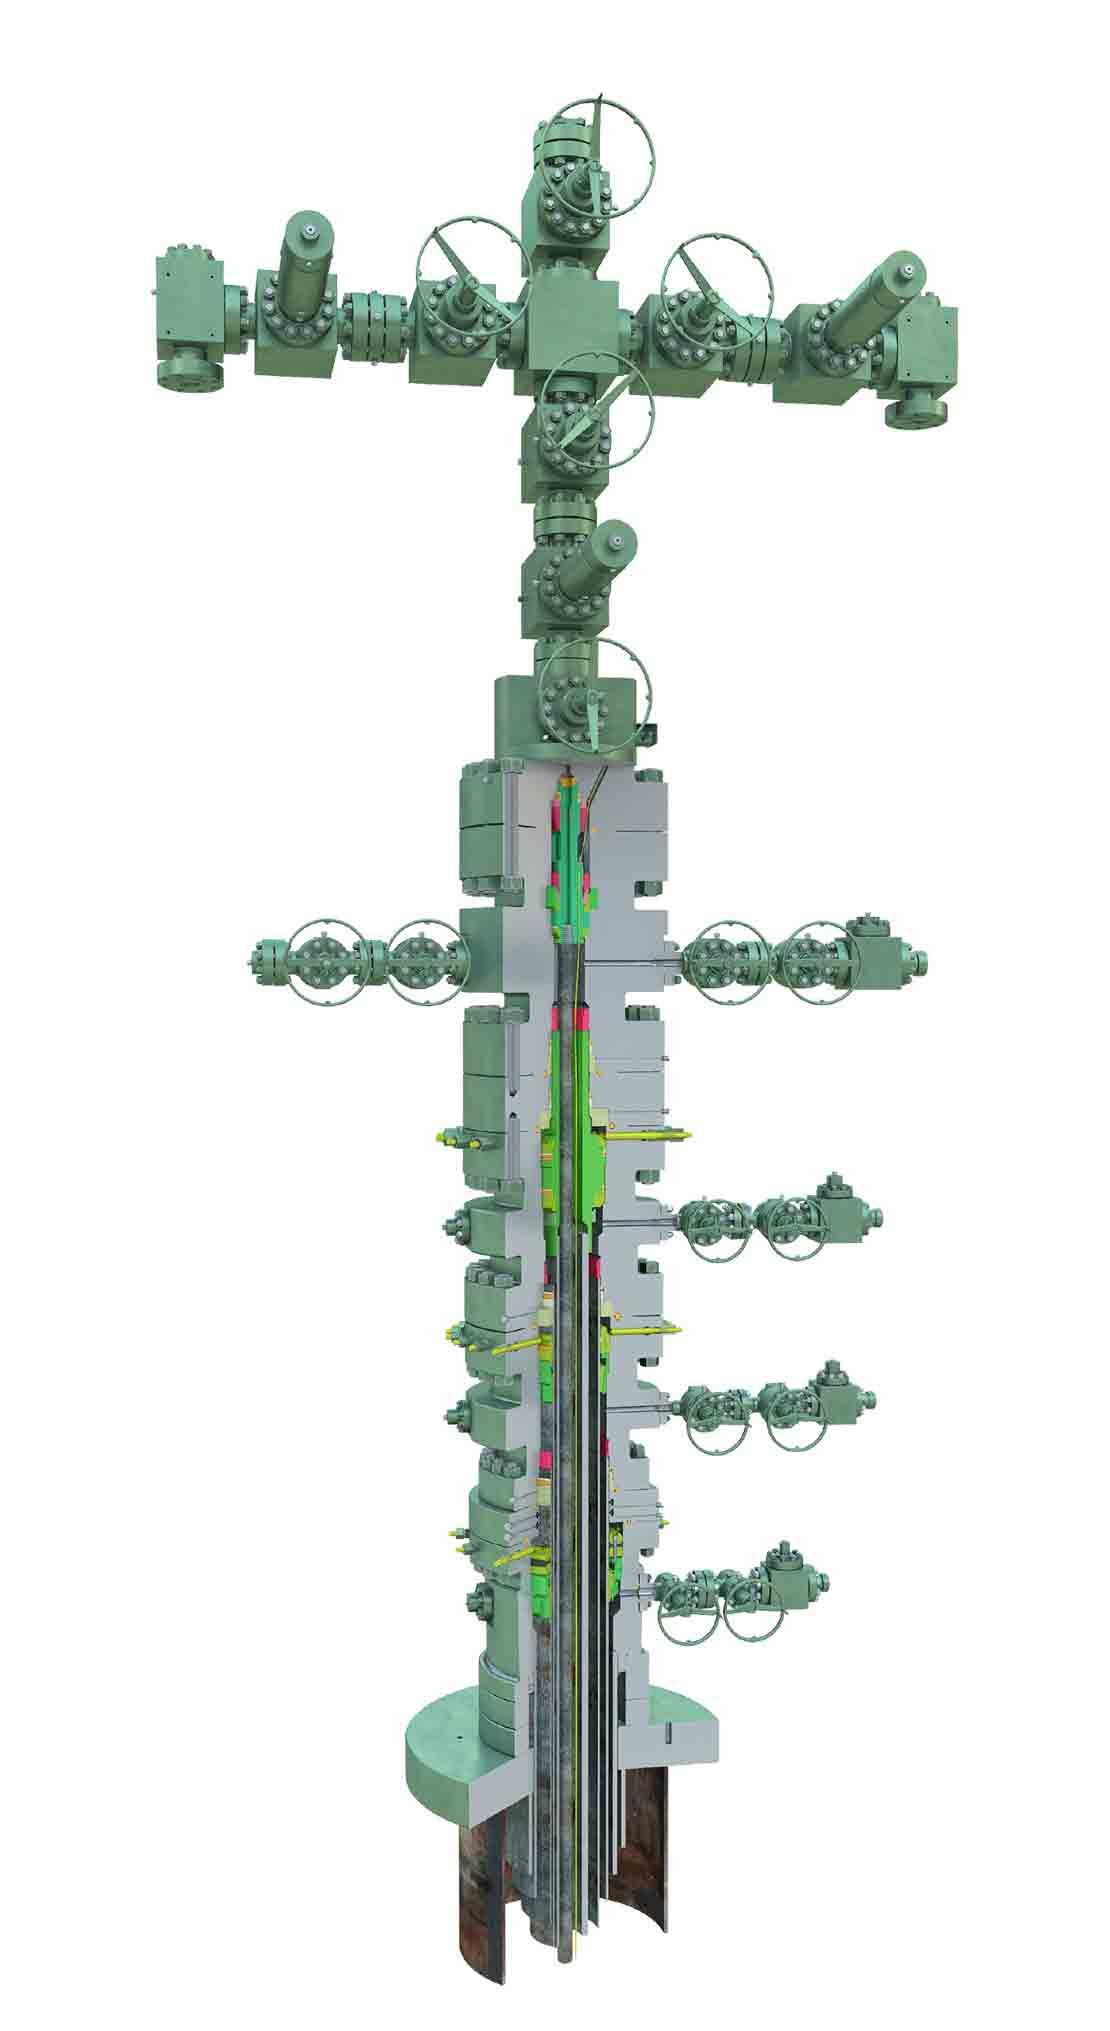 HPHT Wellhead System